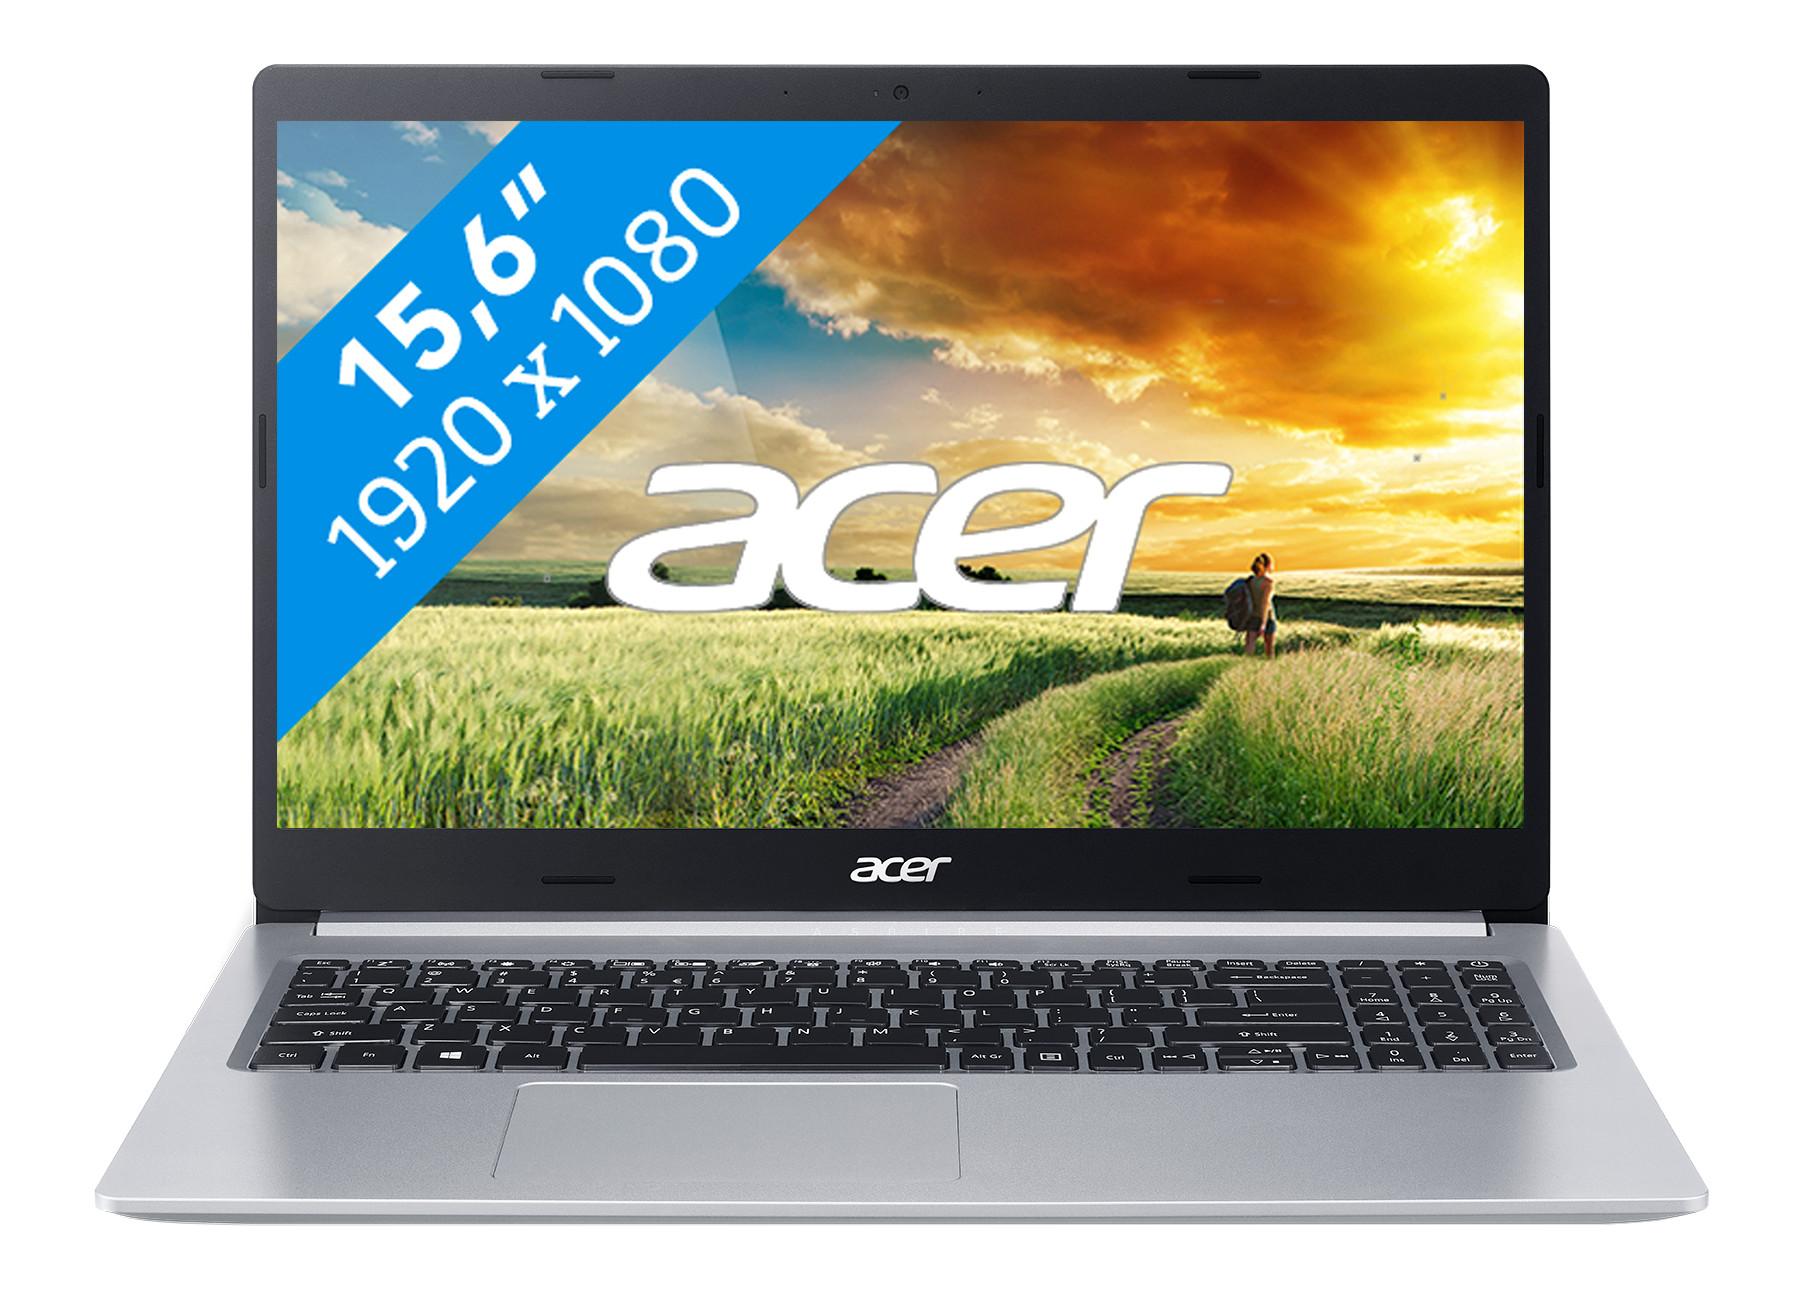 Acer Aspire 5 A515-55-71U6 - Acer laptop met een Quad core processor